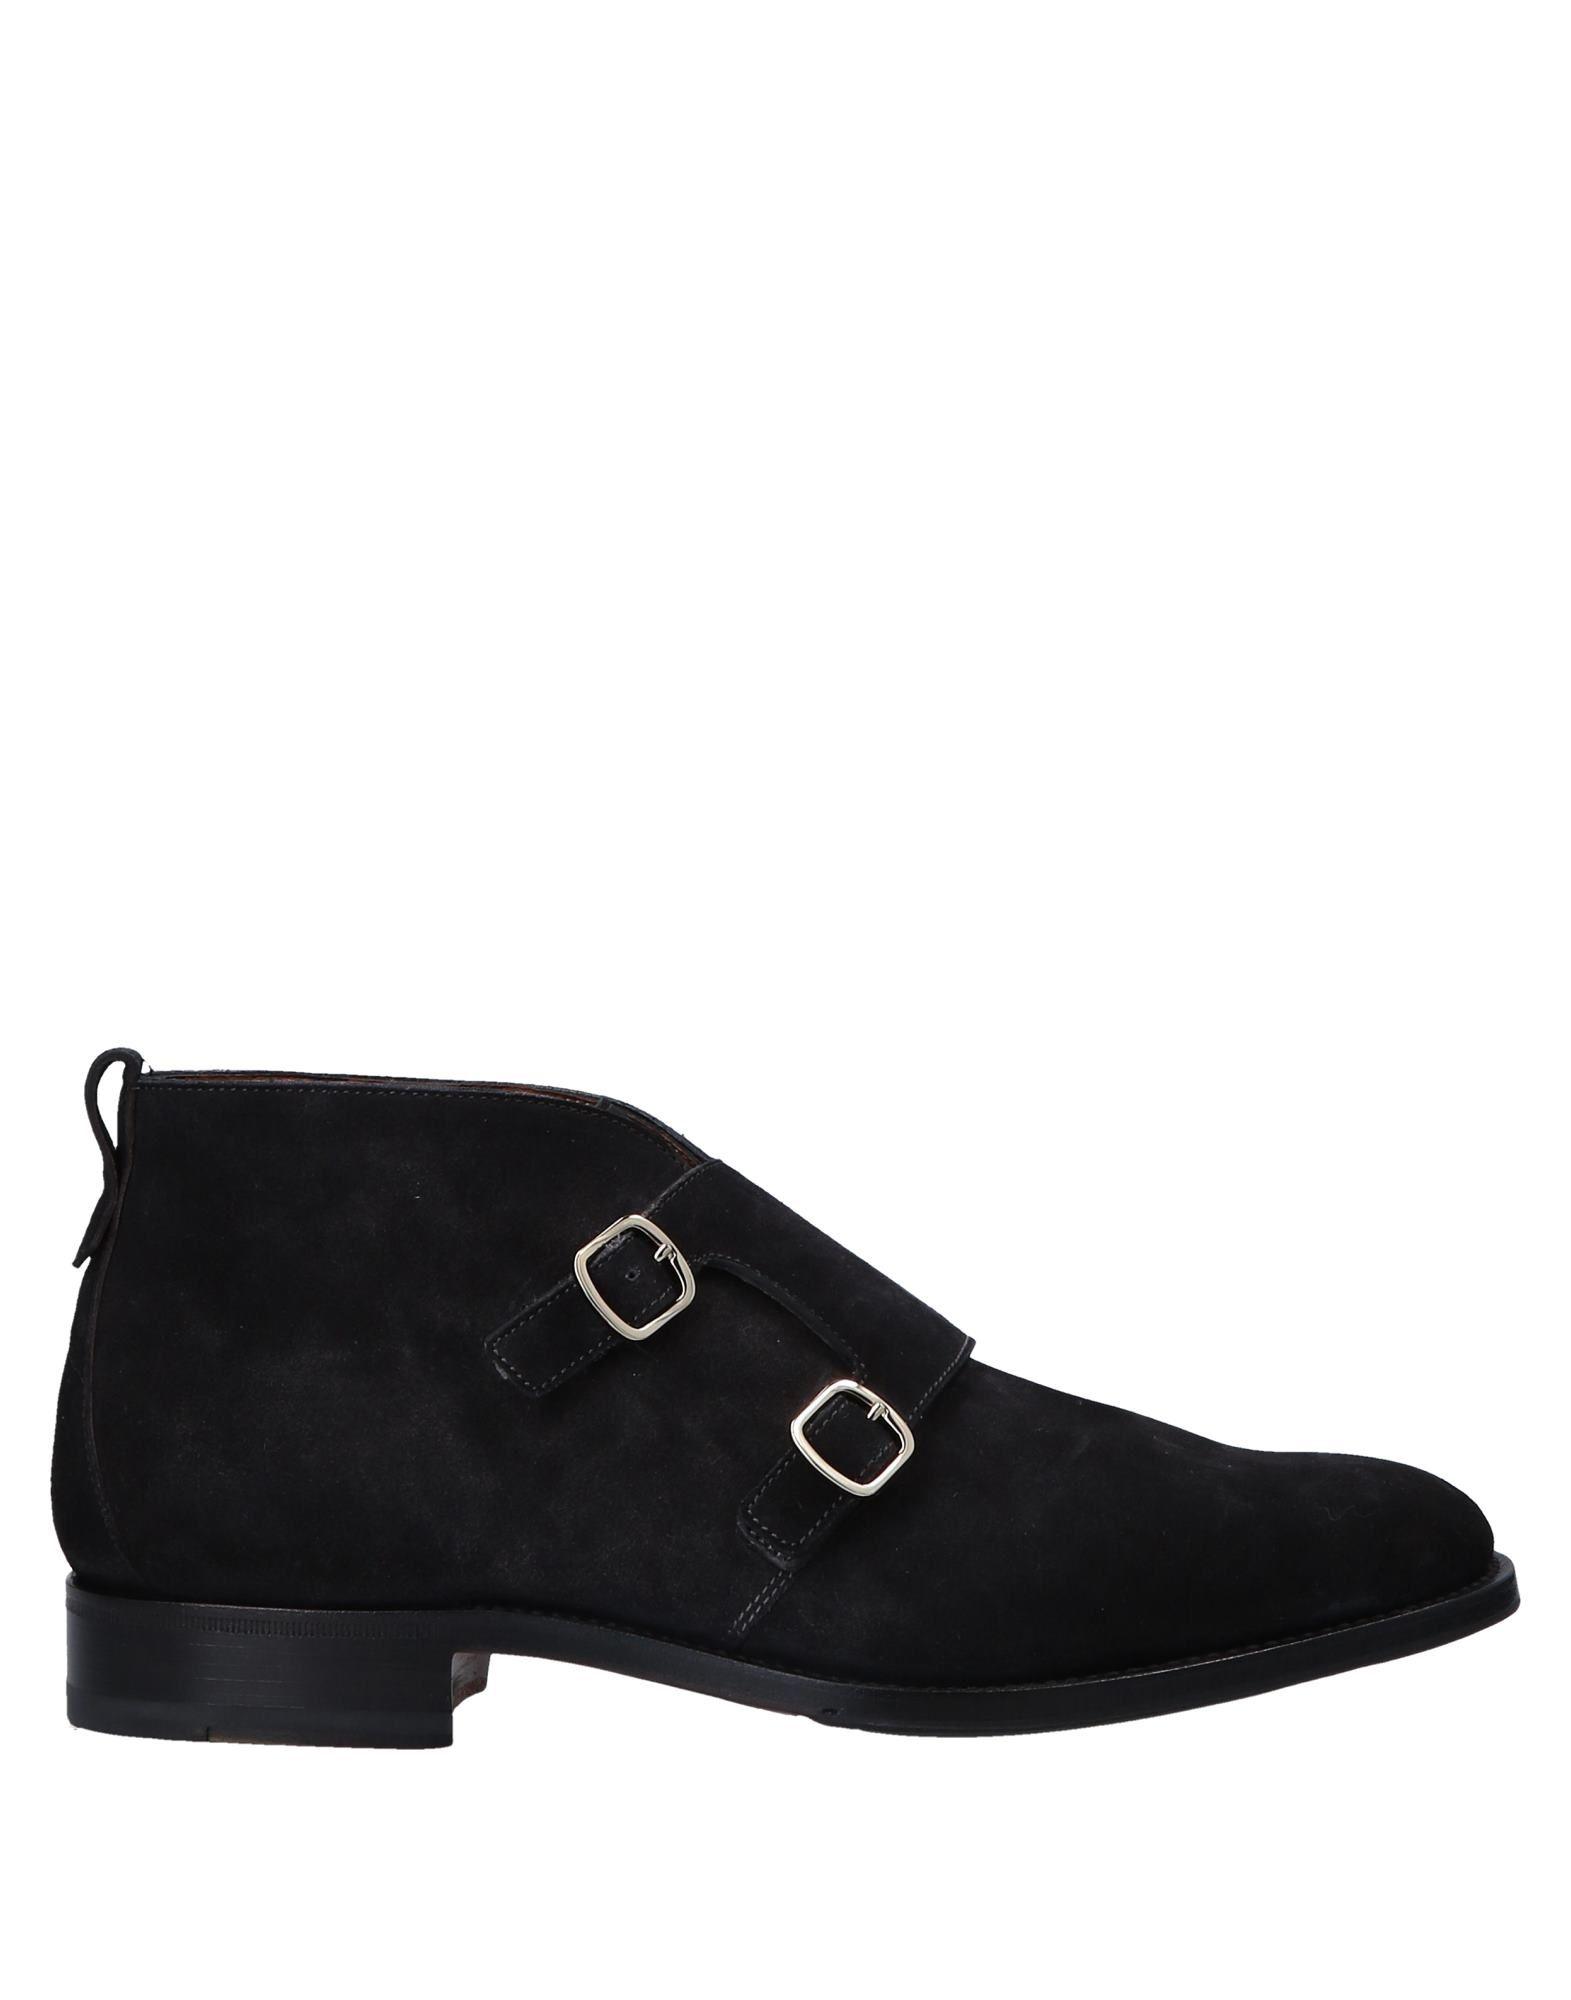 Santoni Mokassins Herren  11554892MM Gute Qualität beliebte Schuhe